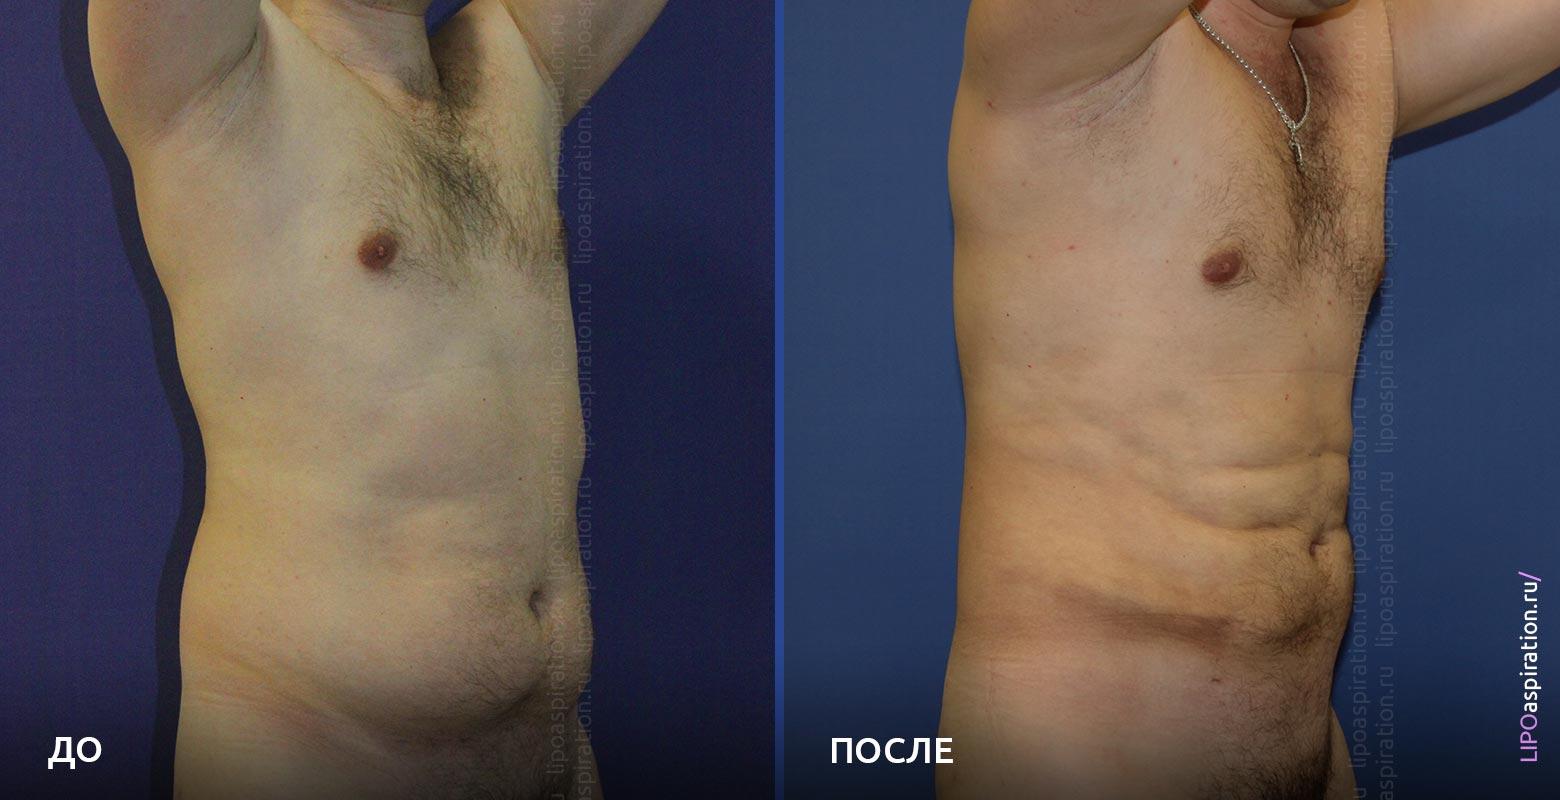 фото до/после липосакции живота у мужчины